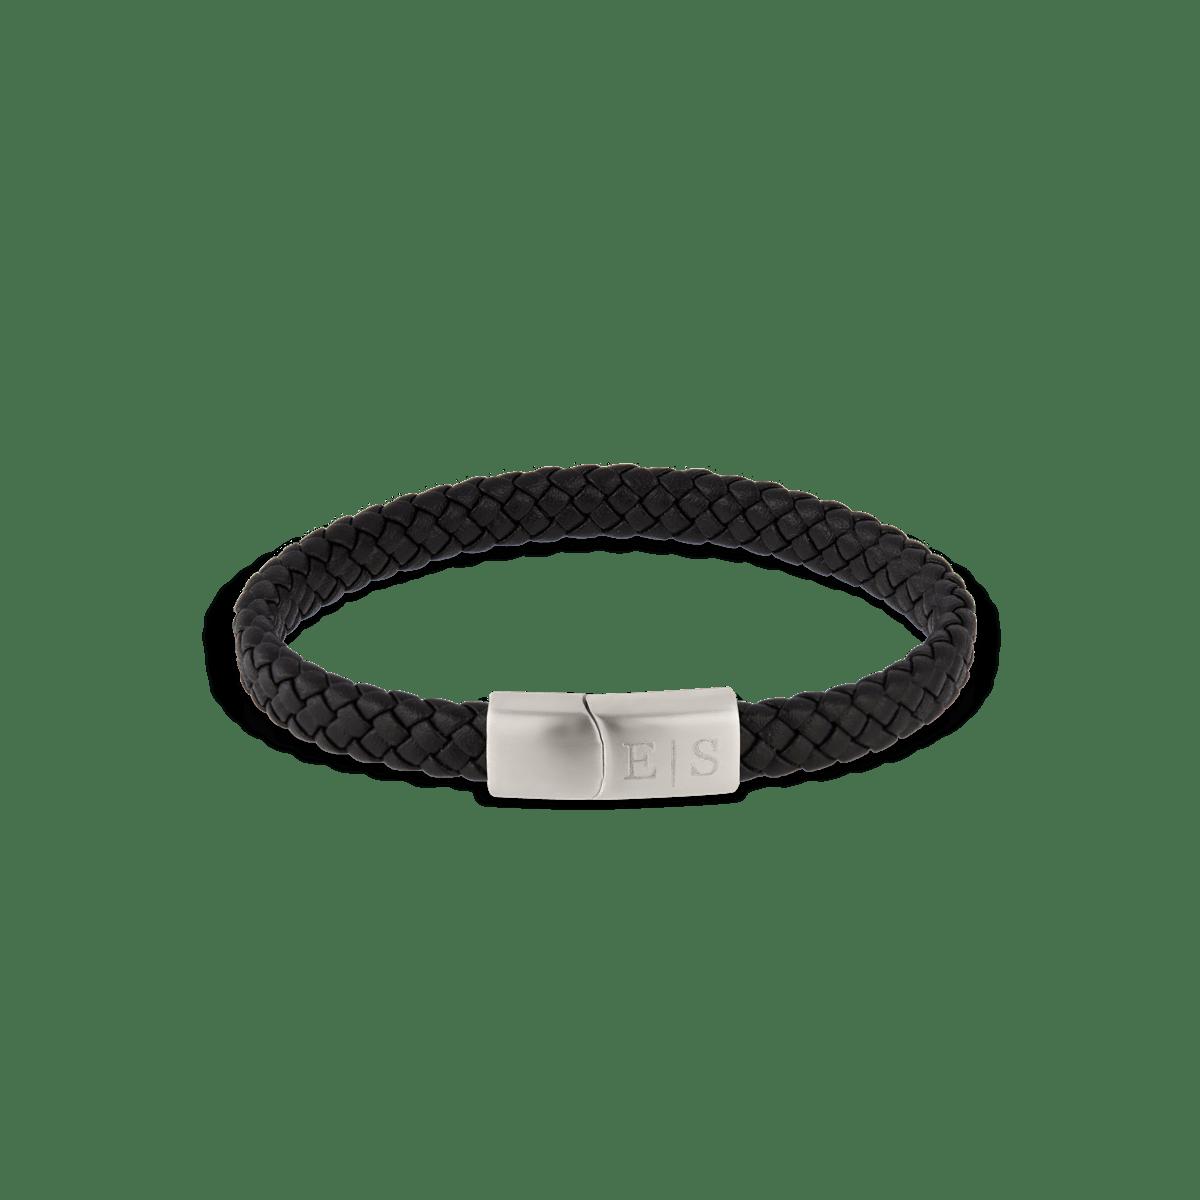 Lewis Leather Initial Bracelet